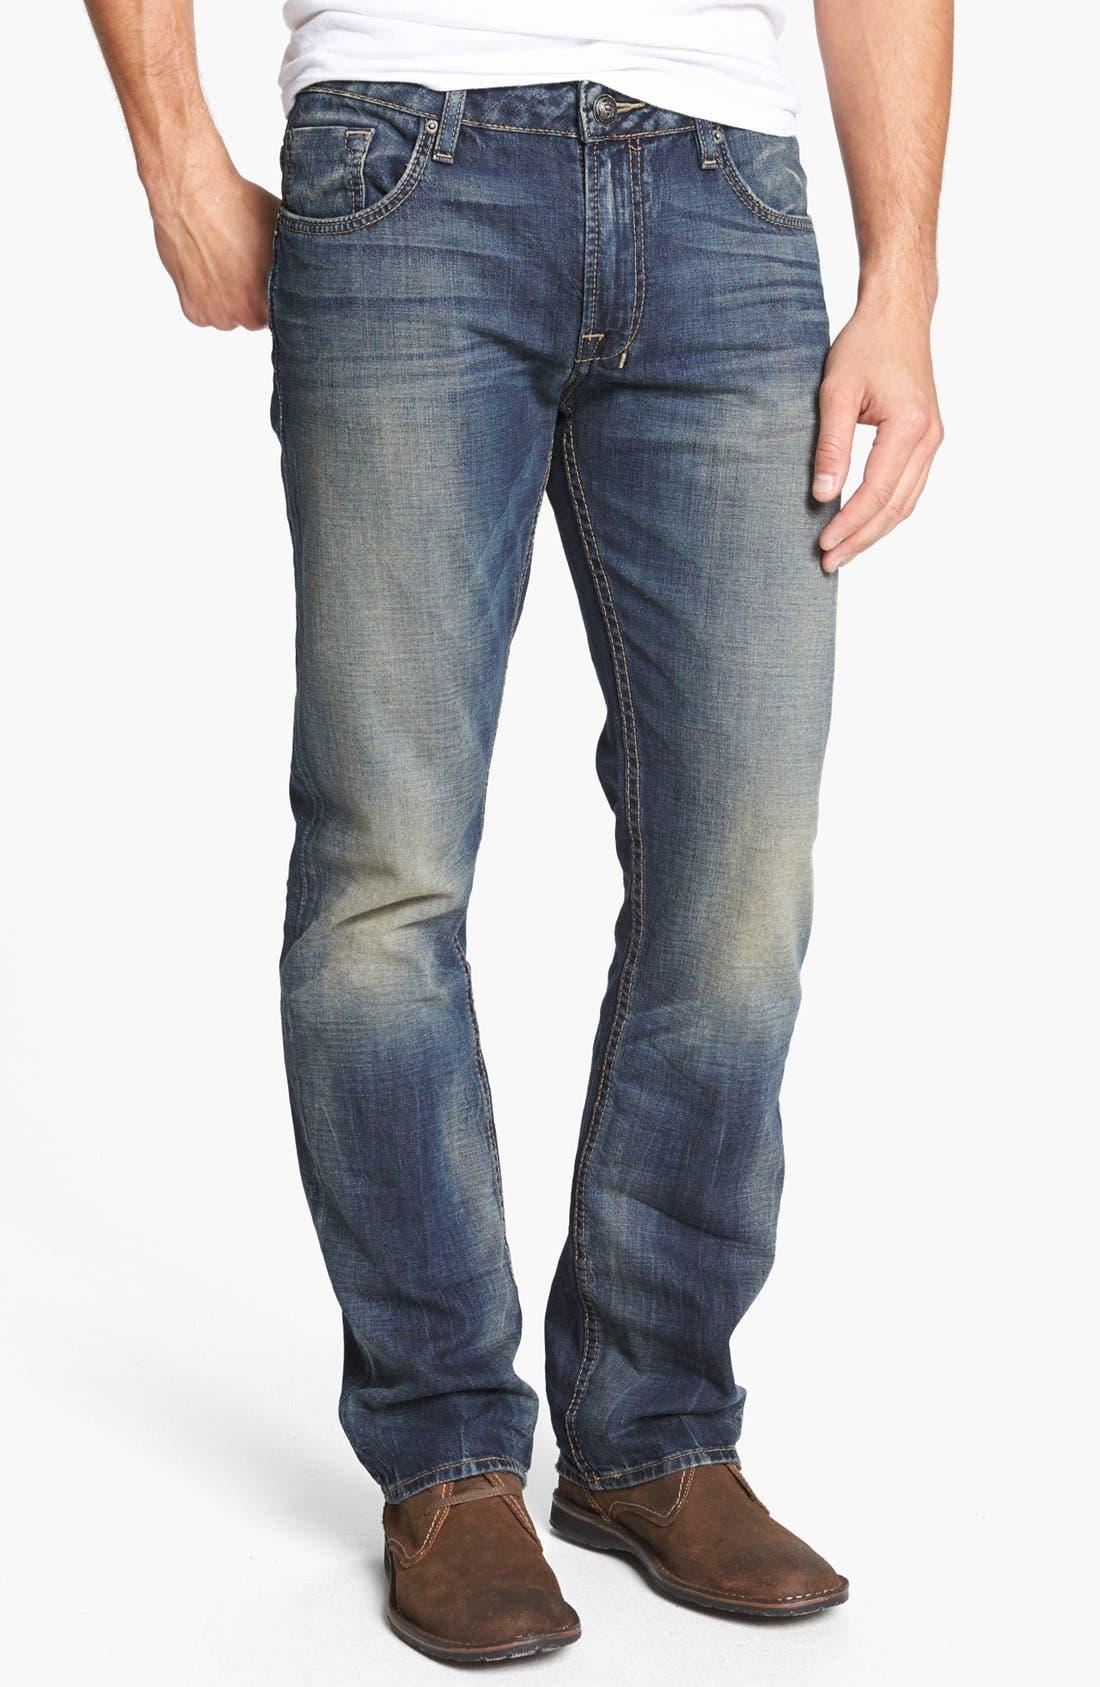 Alternate Image 1 Selected - Buffalo Jeans 'Six' Straight Leg Jeans (Indigo)